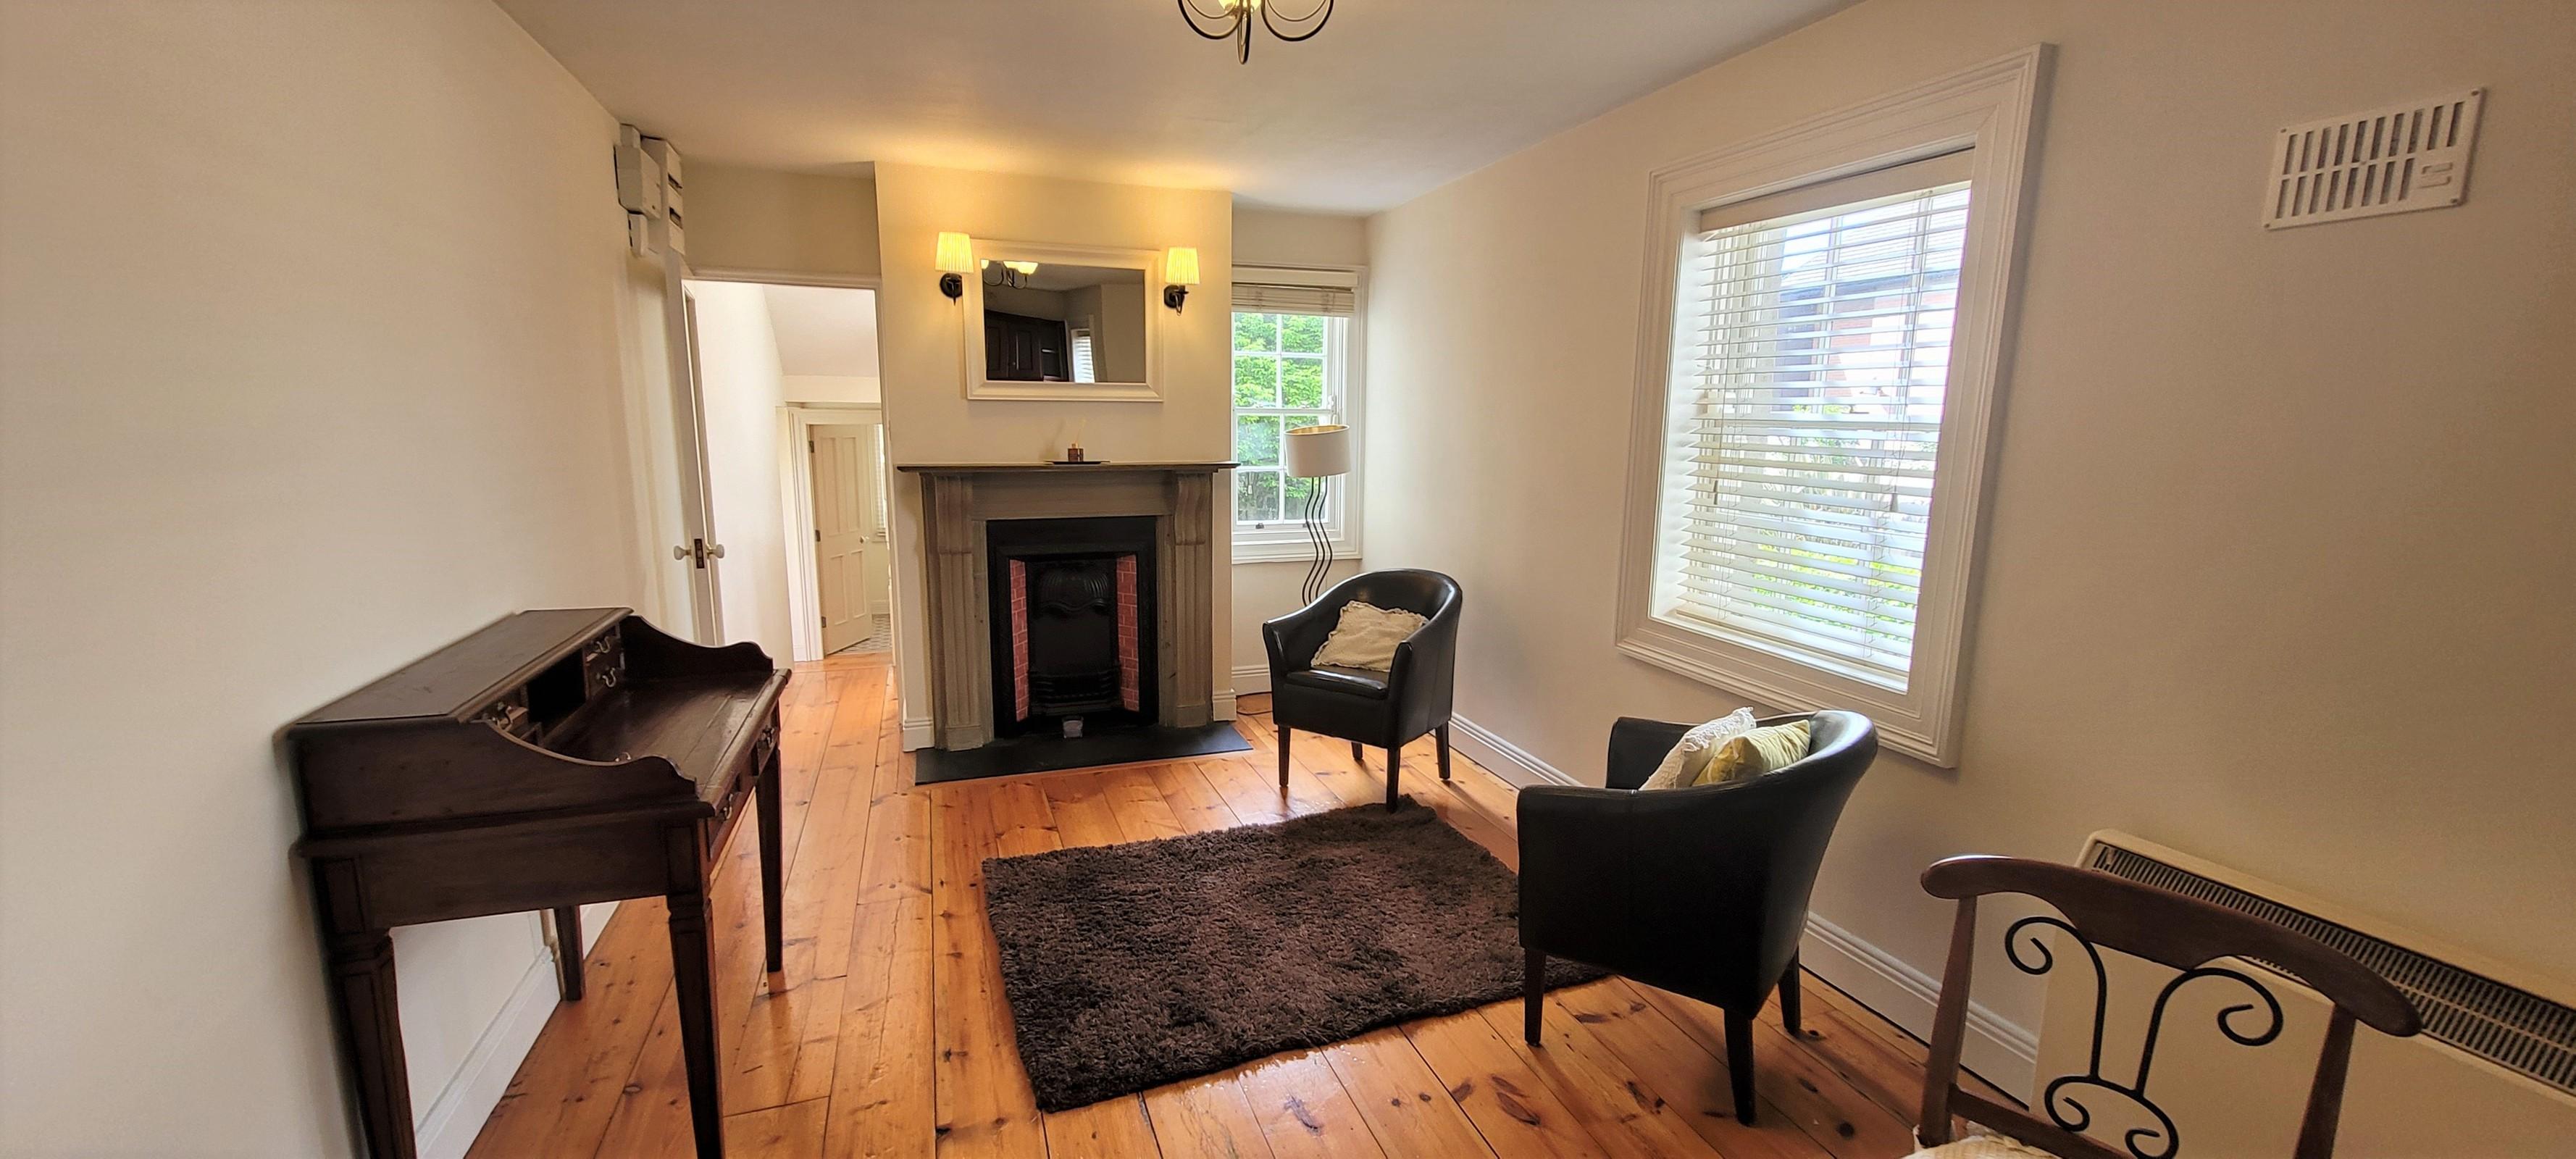 Apartment 6, 43 Pembroke Road, Ballsbridge, Dublin 4